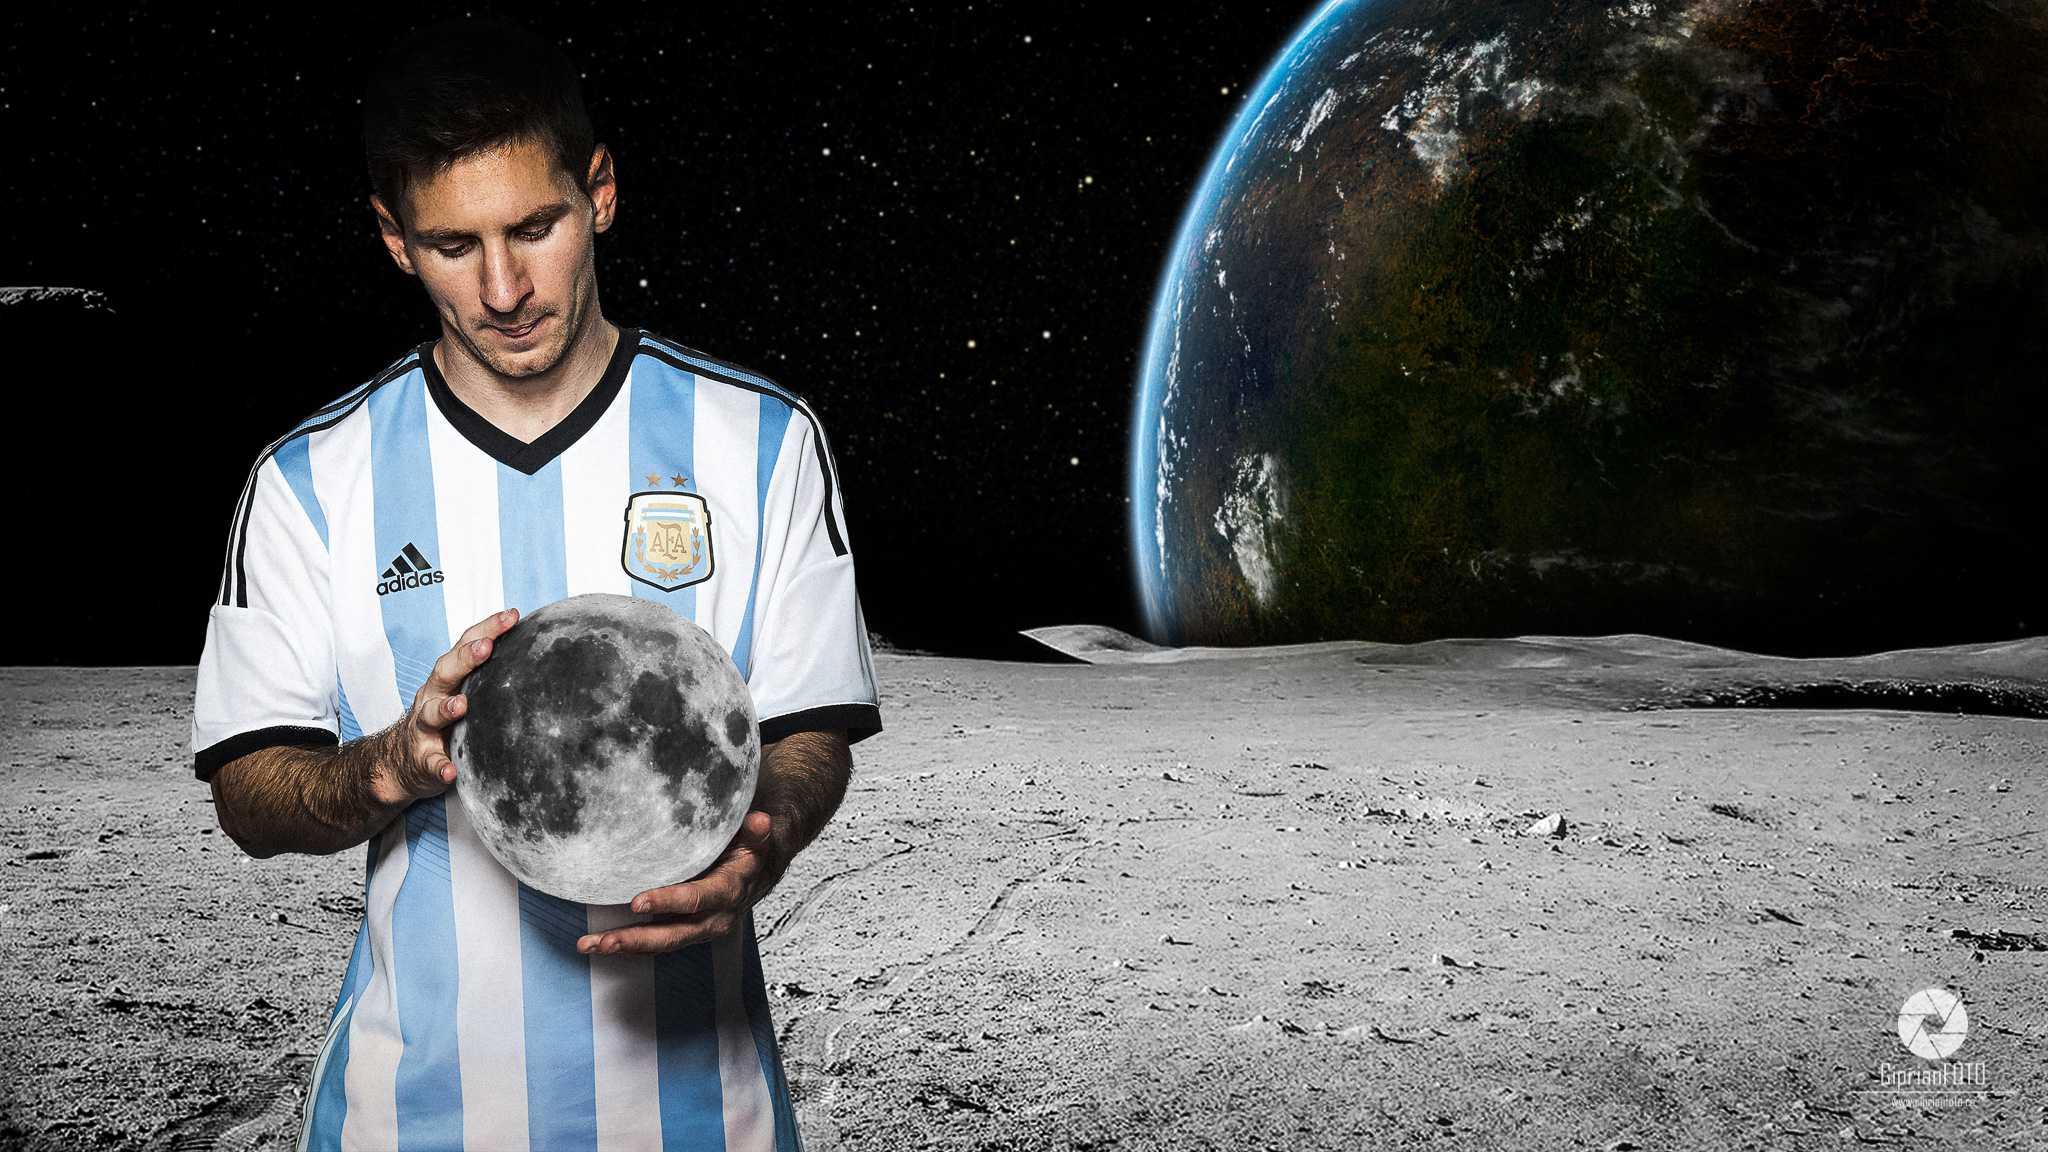 Lionel_Messi_With_Moon_In_Hands_Photoshop_Manipulation_Tutorial_CiprianFOTO